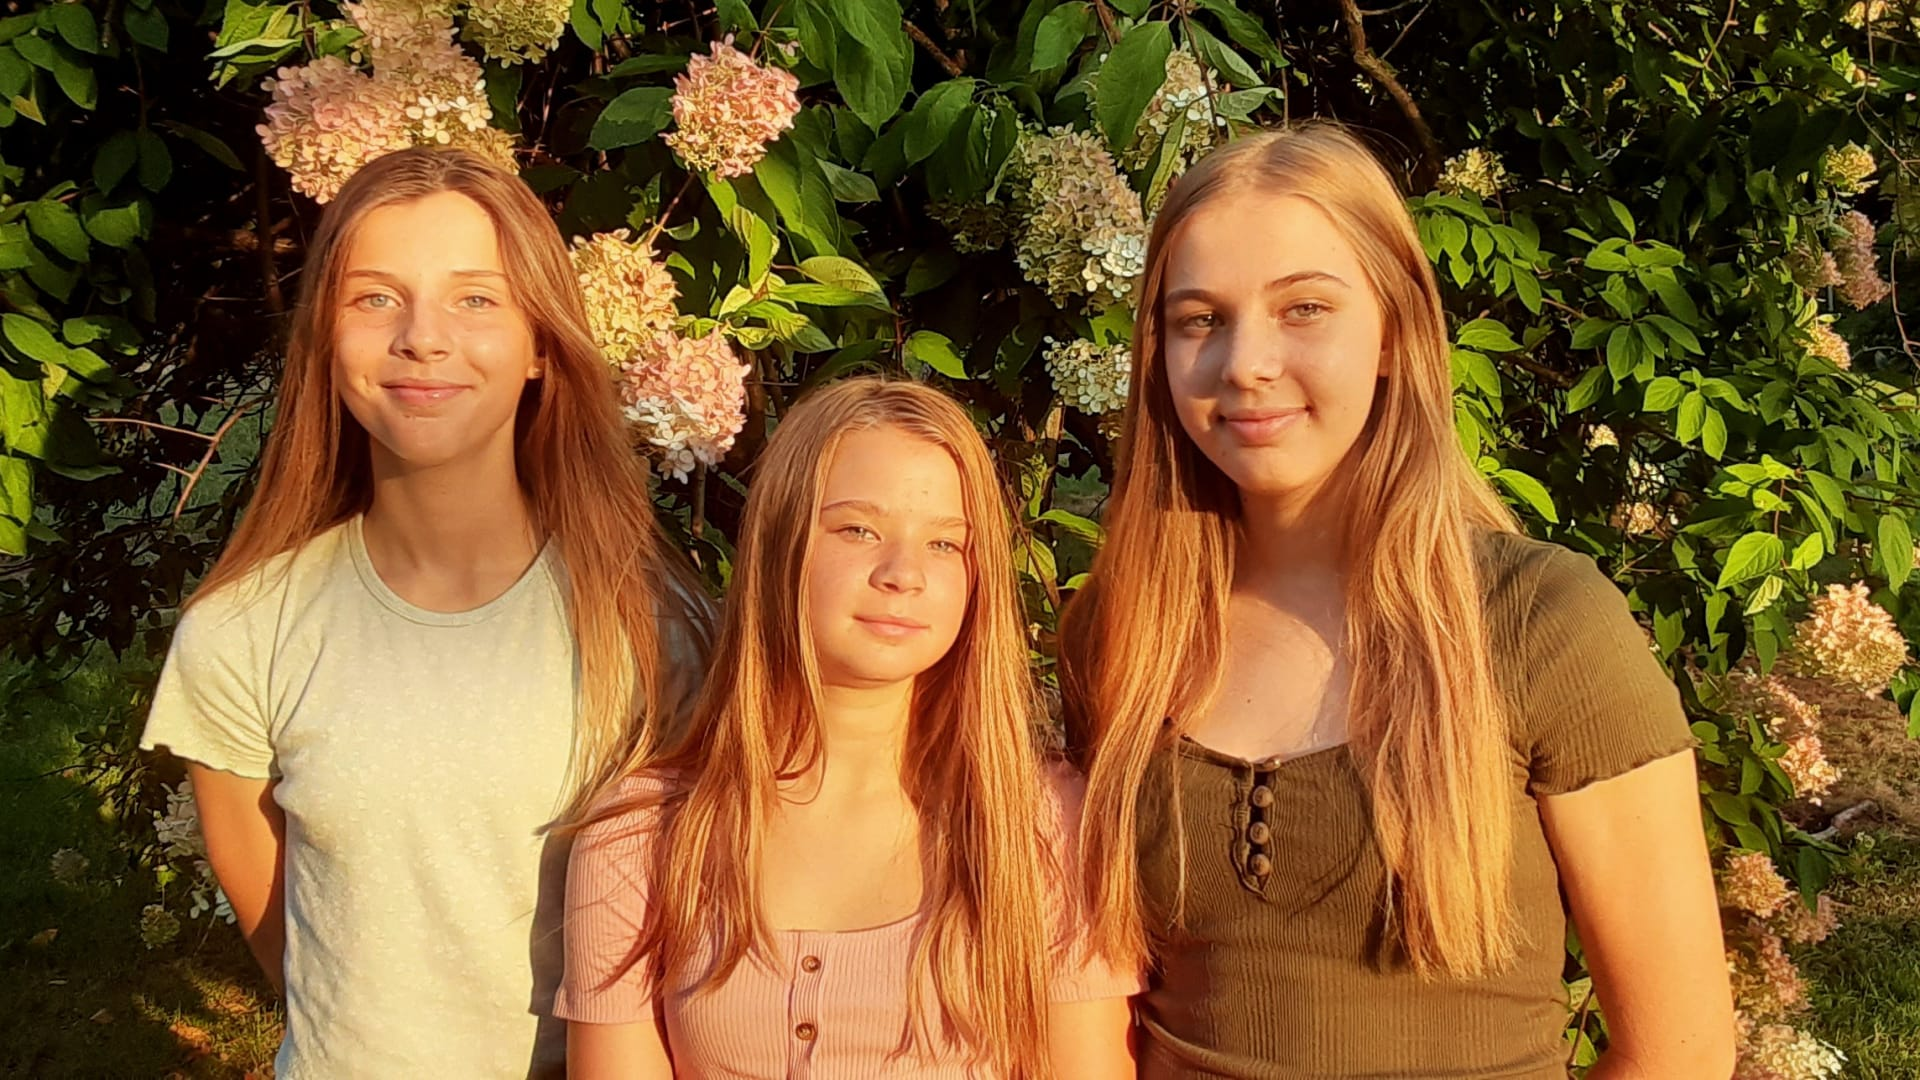 From left: Ashley, Keagan, and Kayla Serverius.